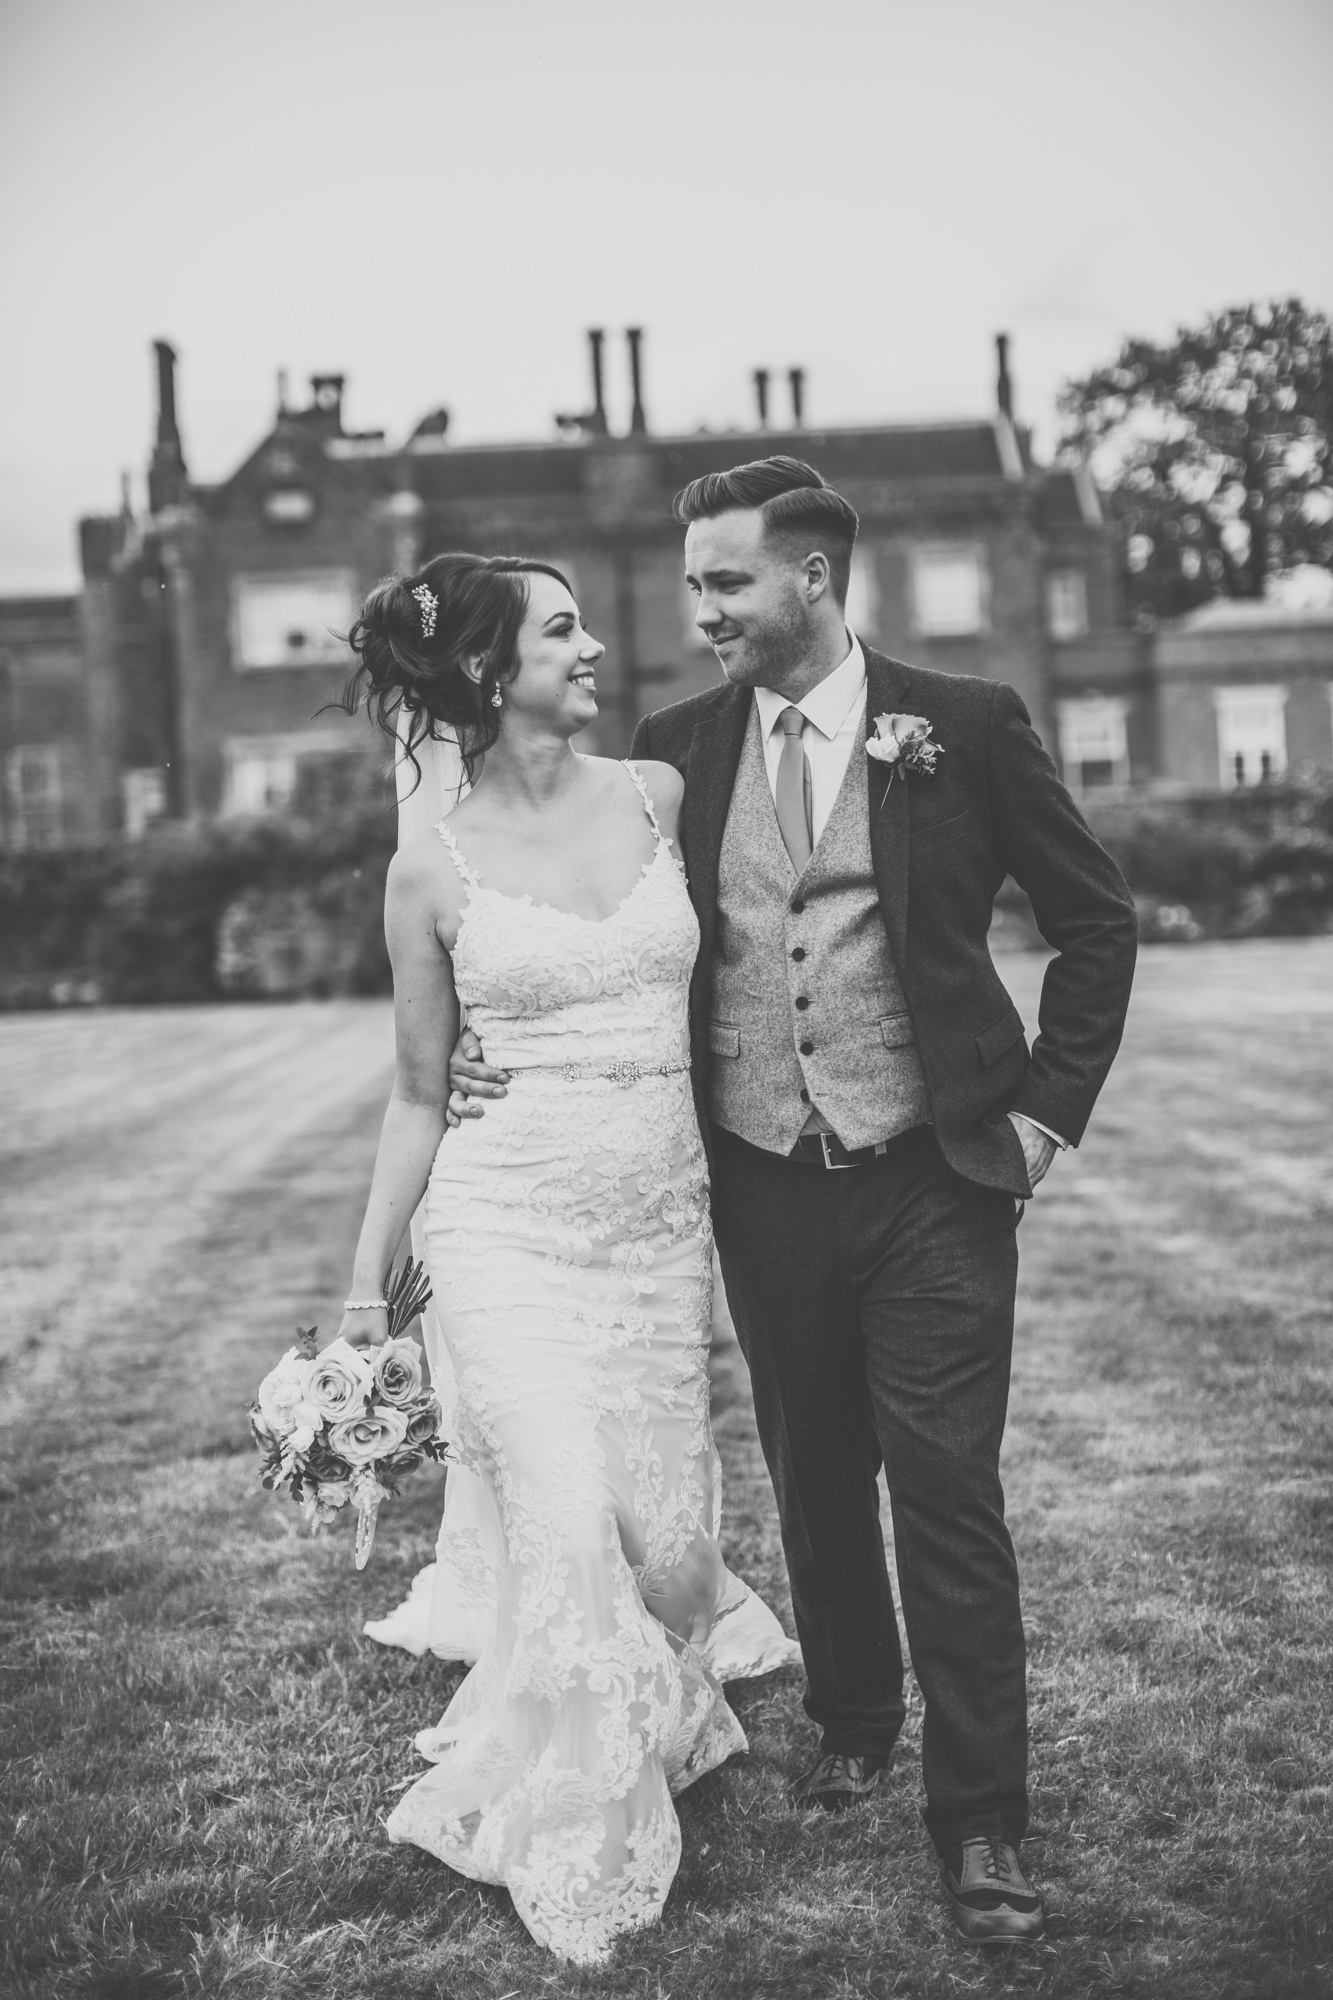 hodsock priory wedding photographers blog61.jpg